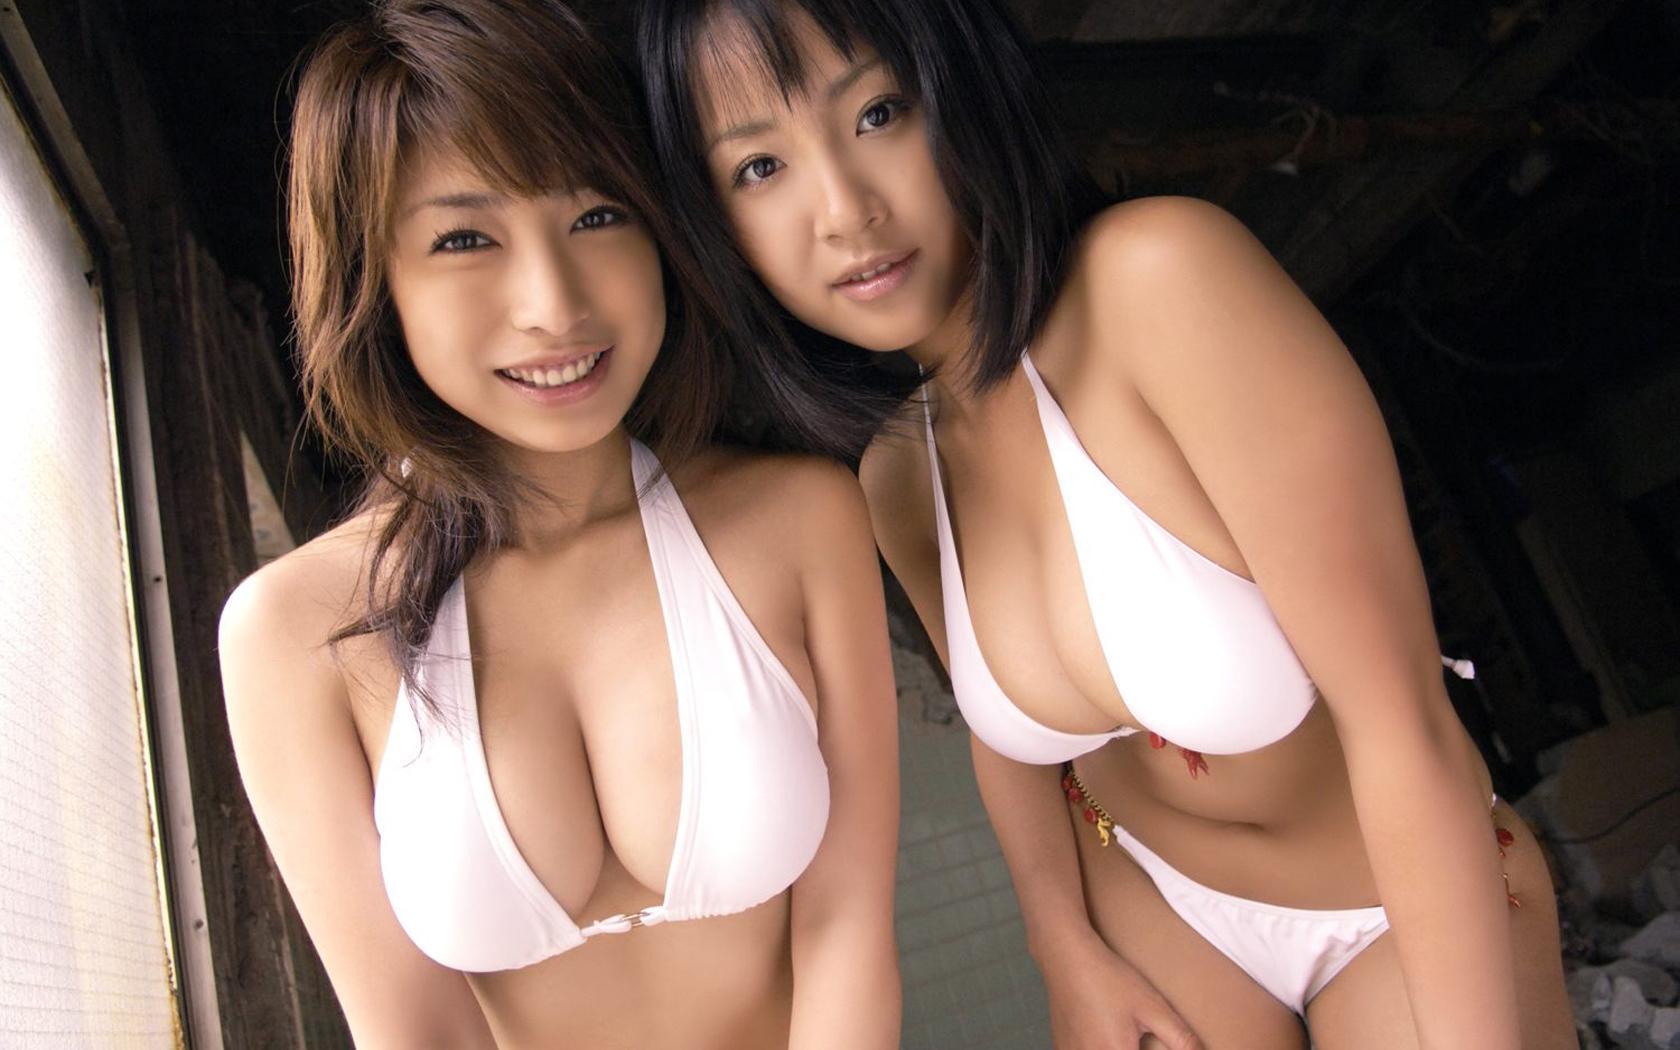 азиатки малолетки